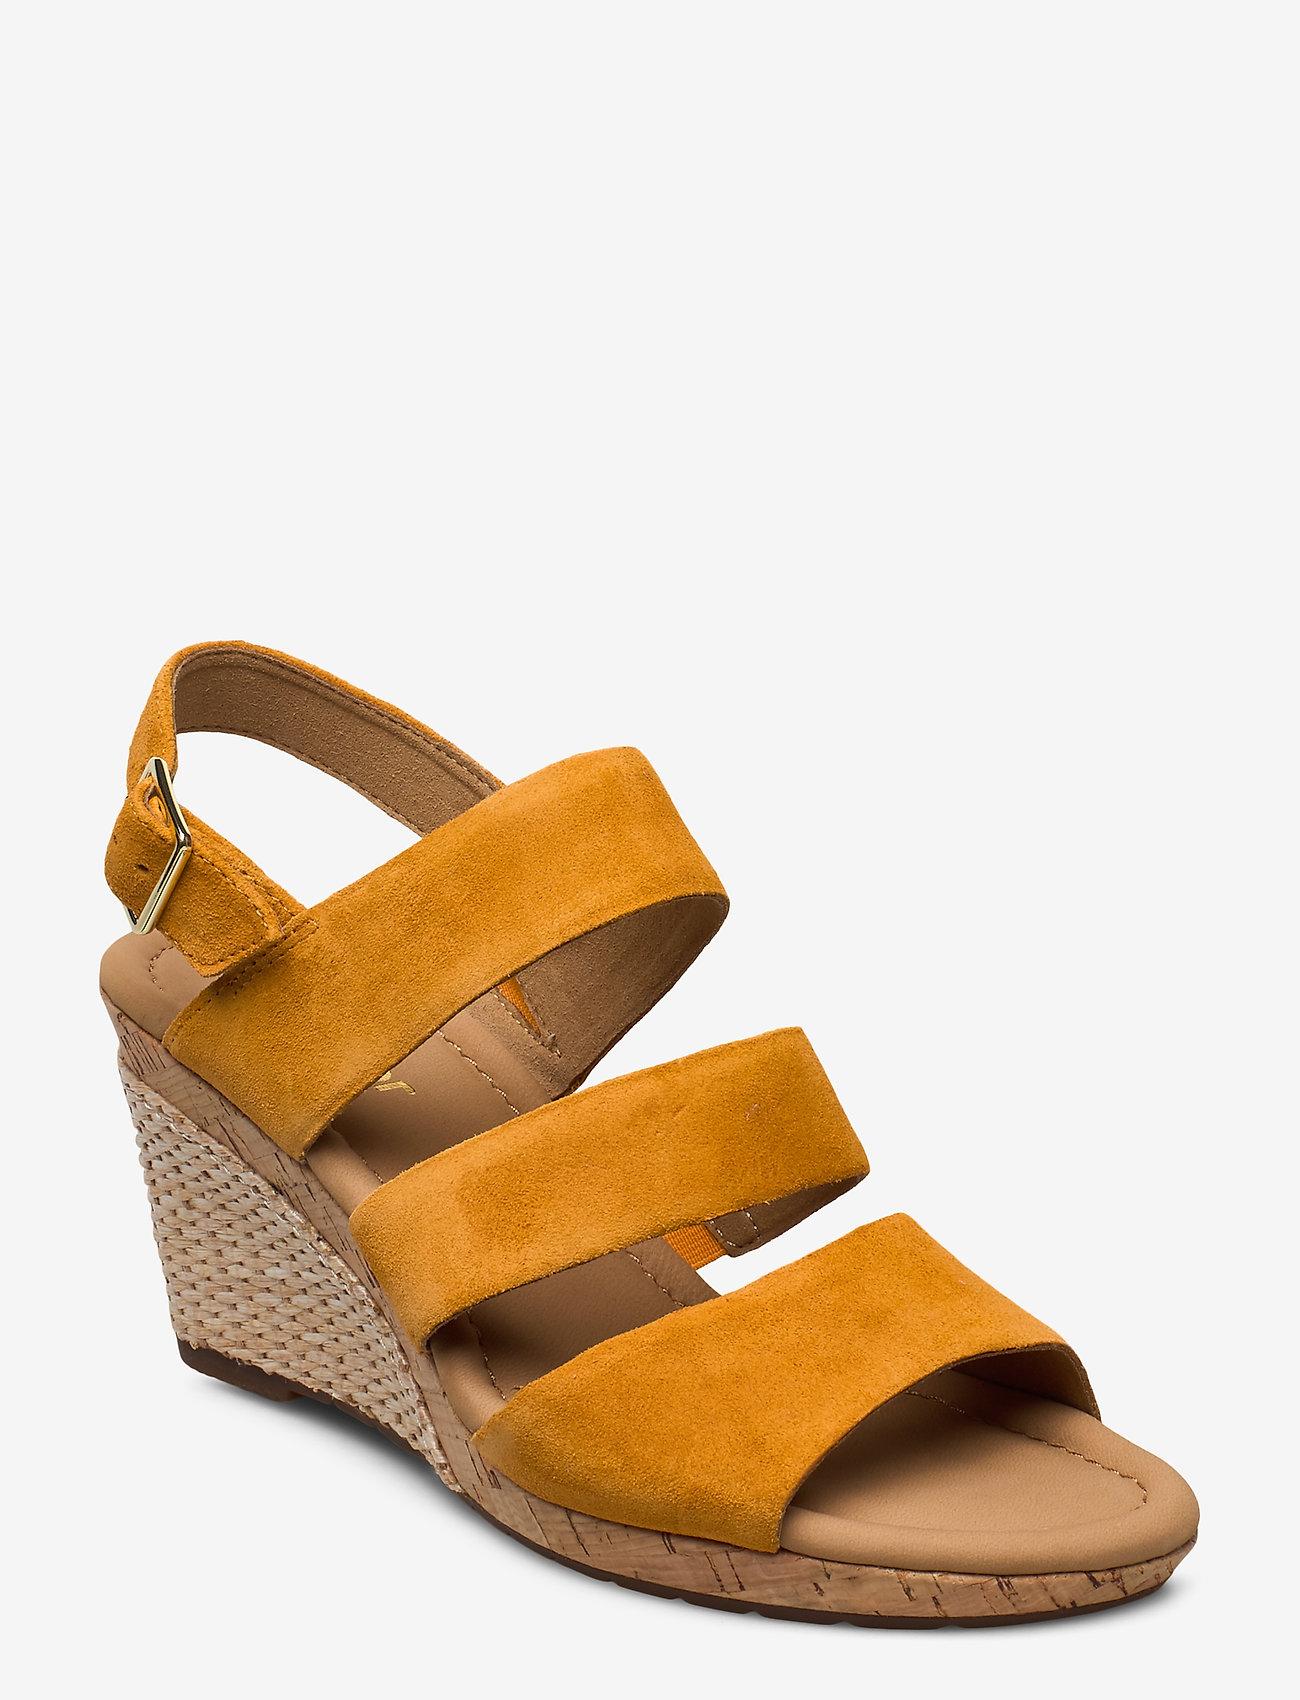 Gabor - sandals - espadrilles met sleehak - other colour - 0